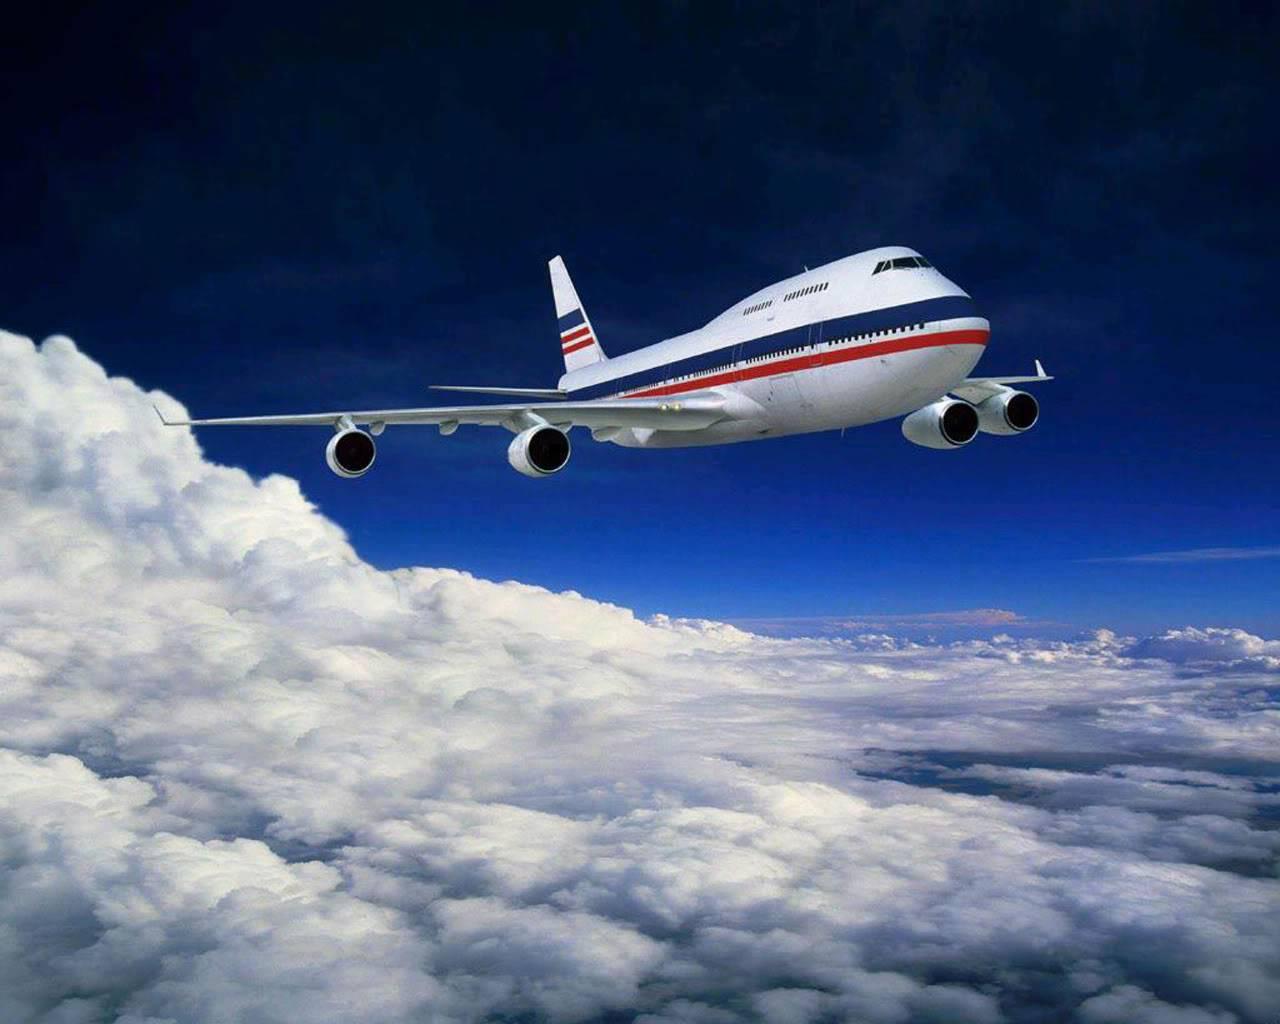 Airplane | 飛行機 | Máy bay Airplane11280